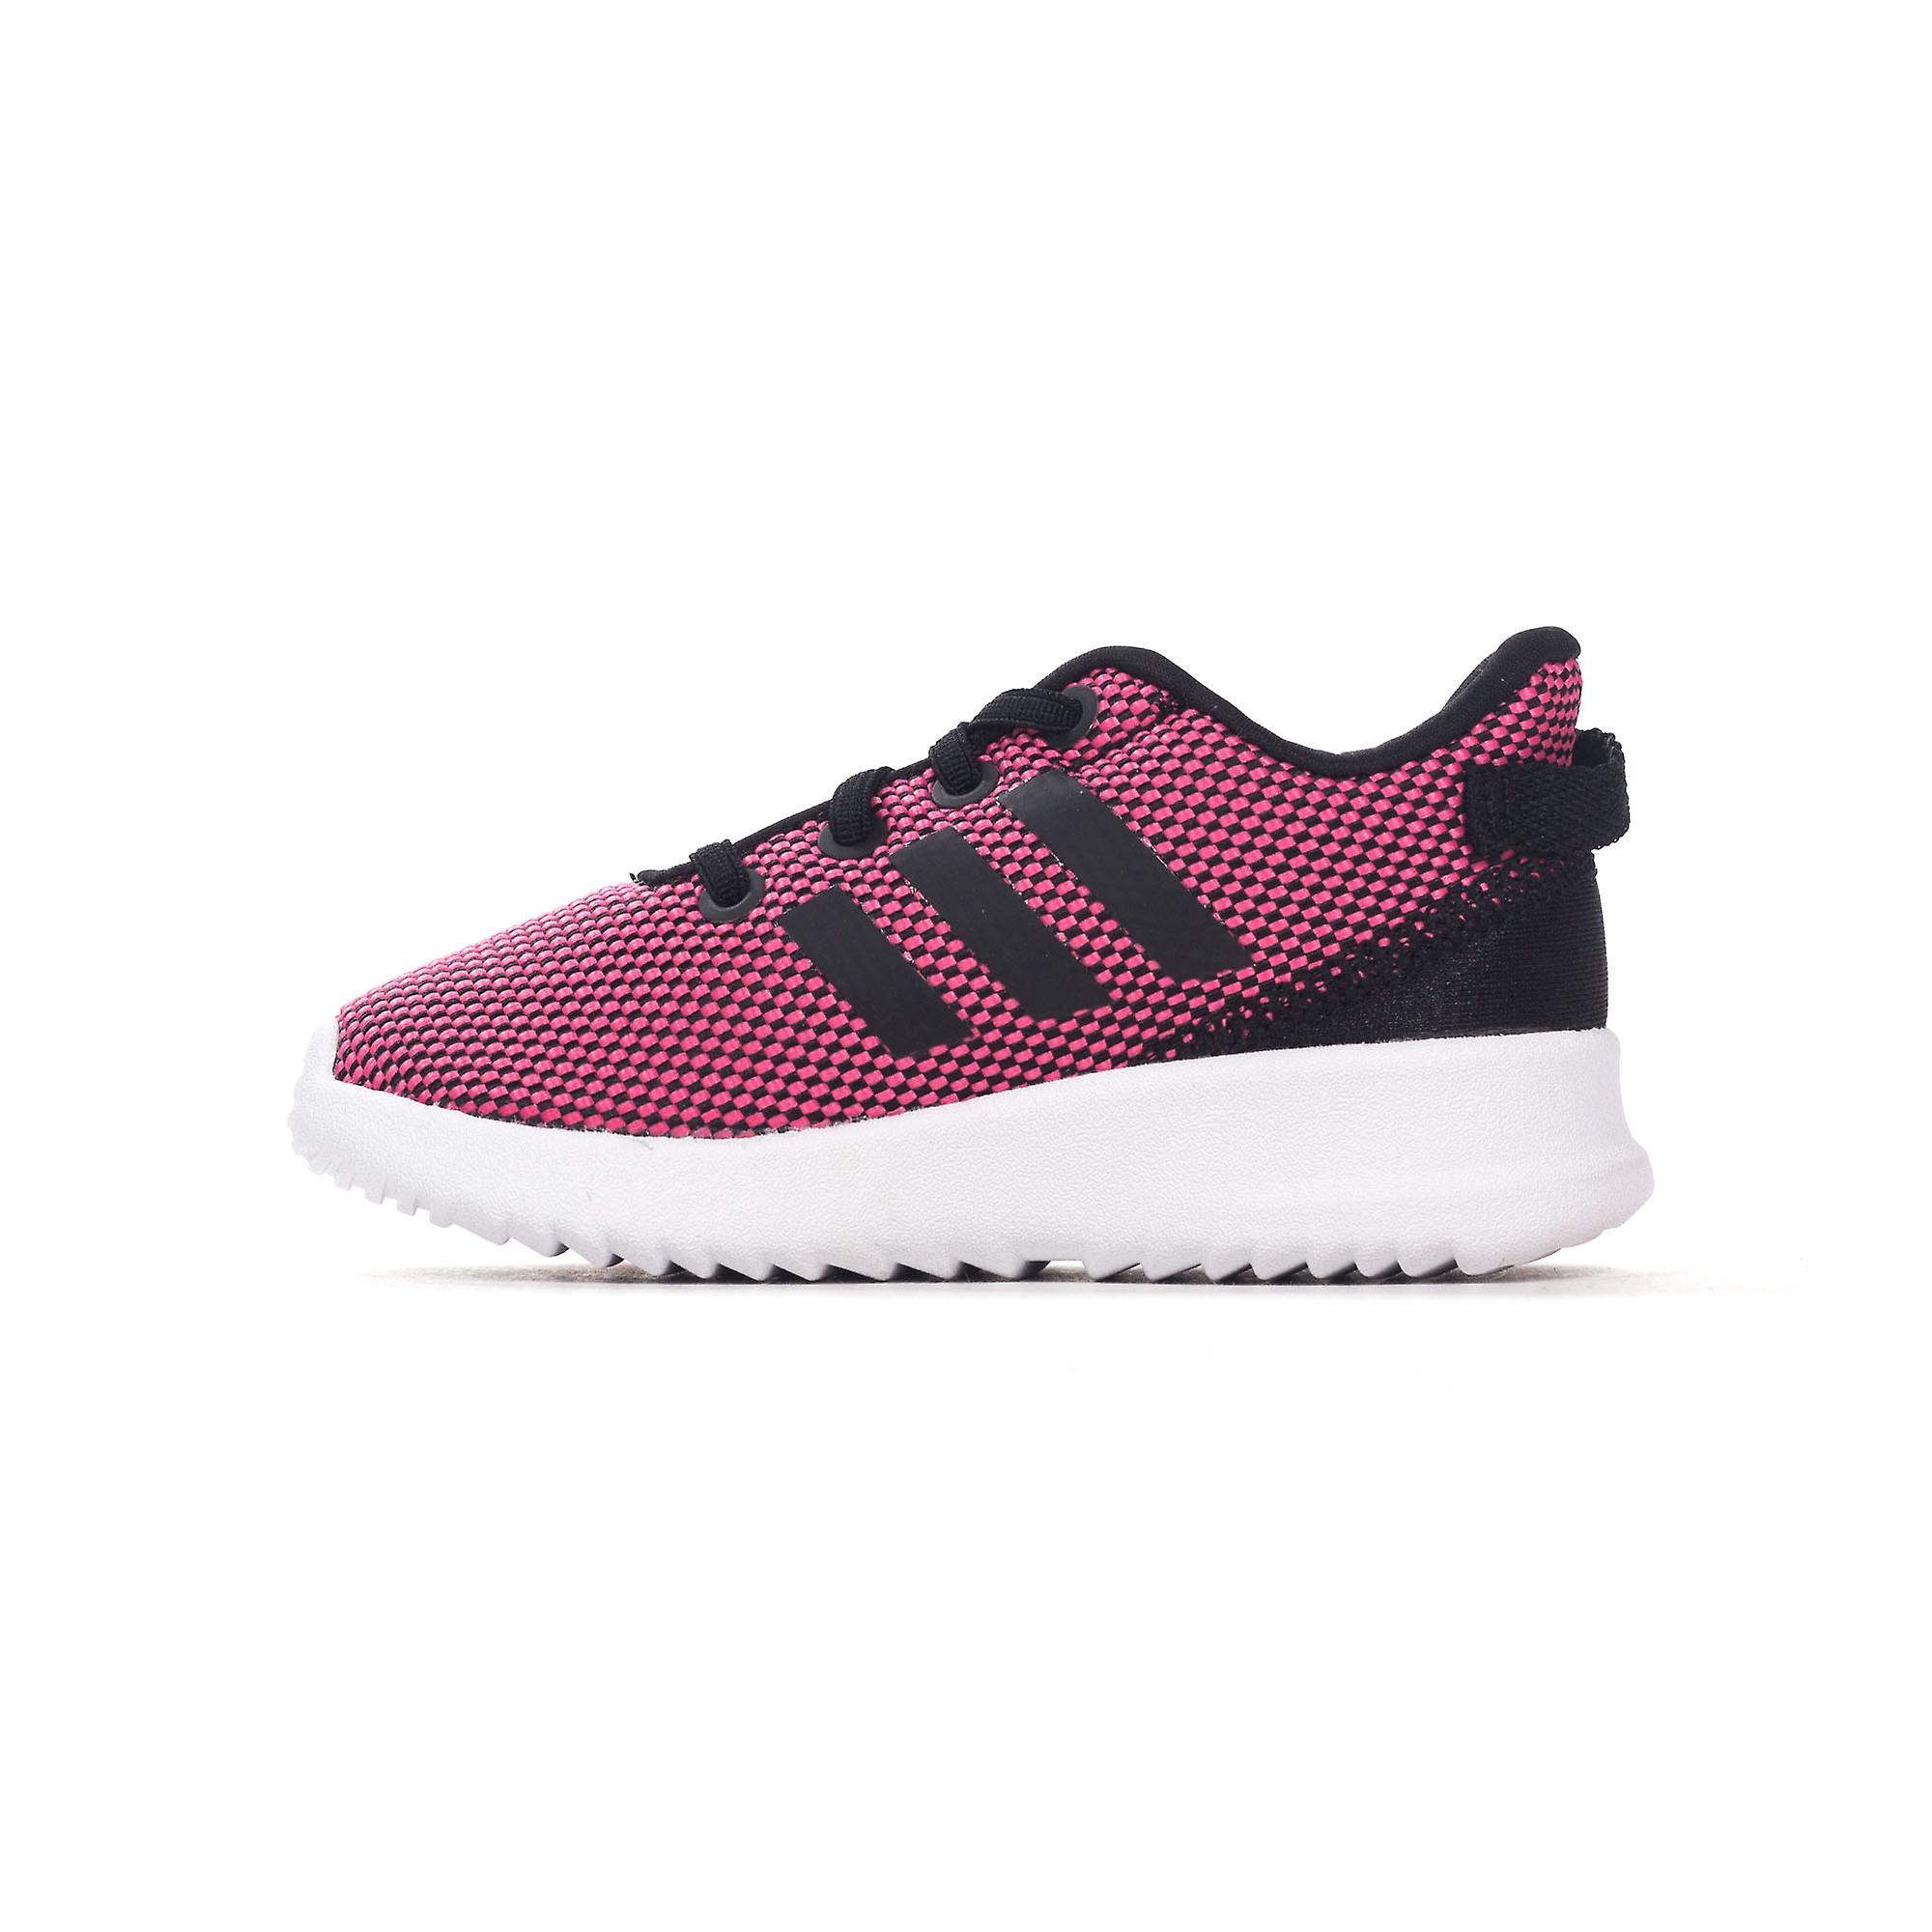 Adidas NEO Racer St spedbarn barn jenter Sports trener sko rosahvit